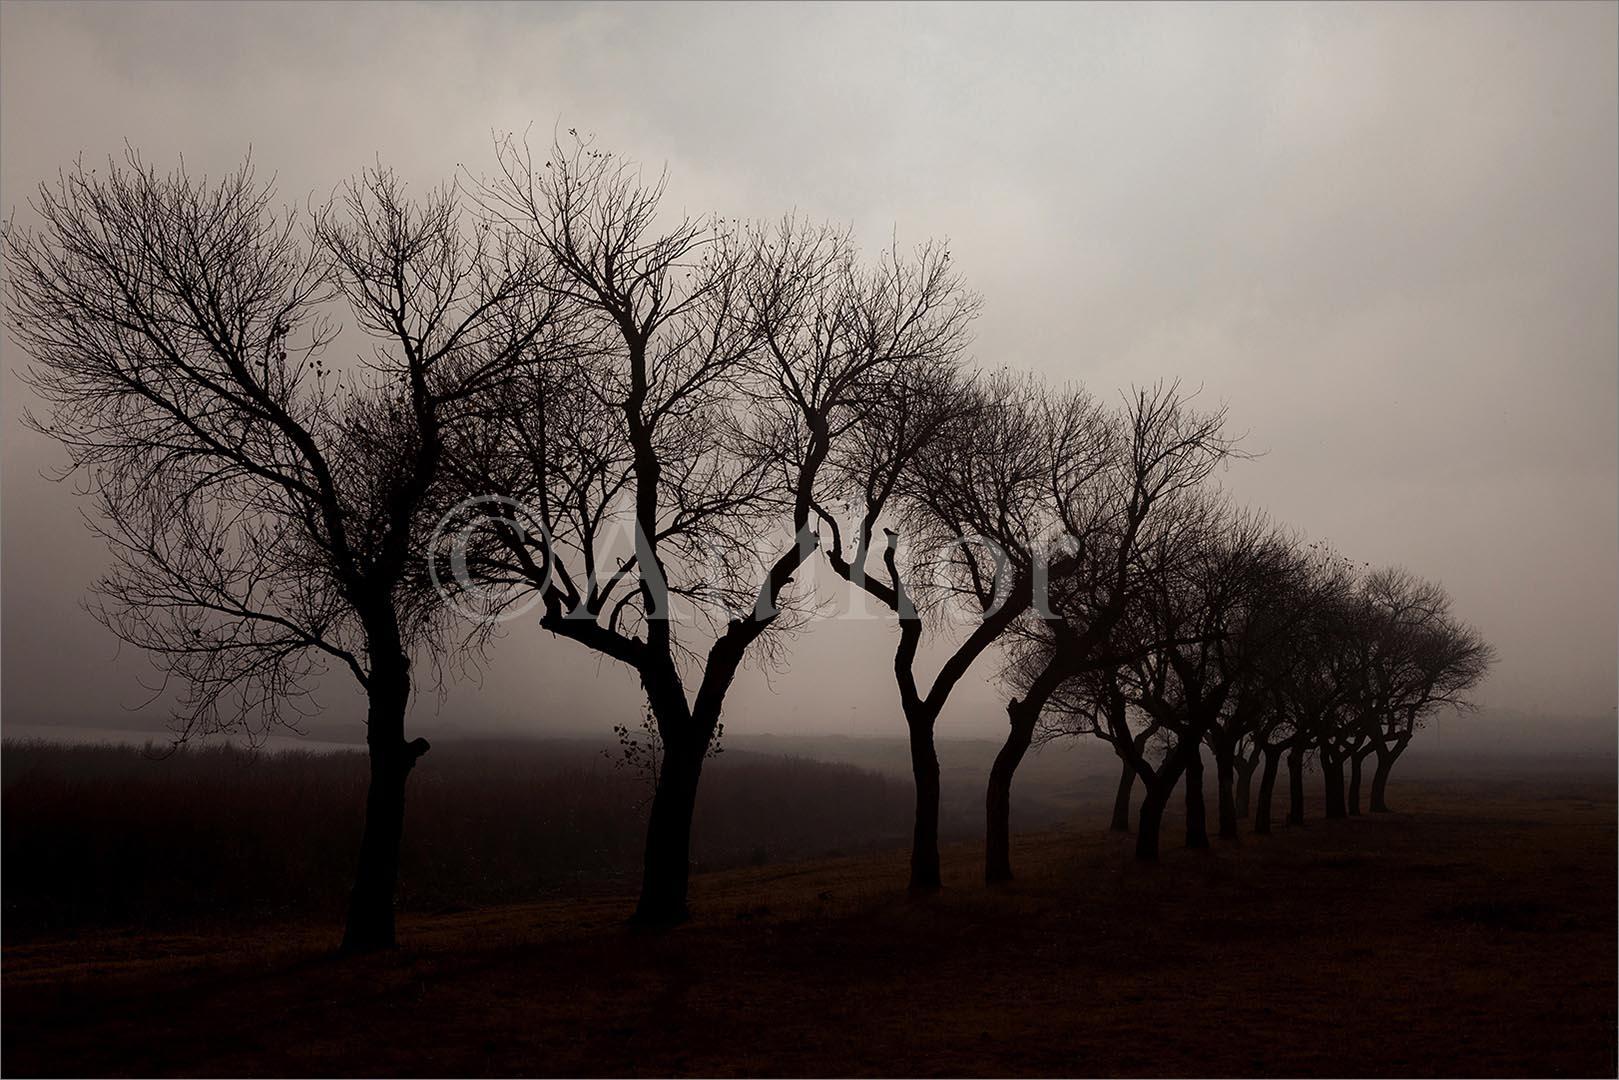 3_NA_its a misty morning_Kenneth Kubheka